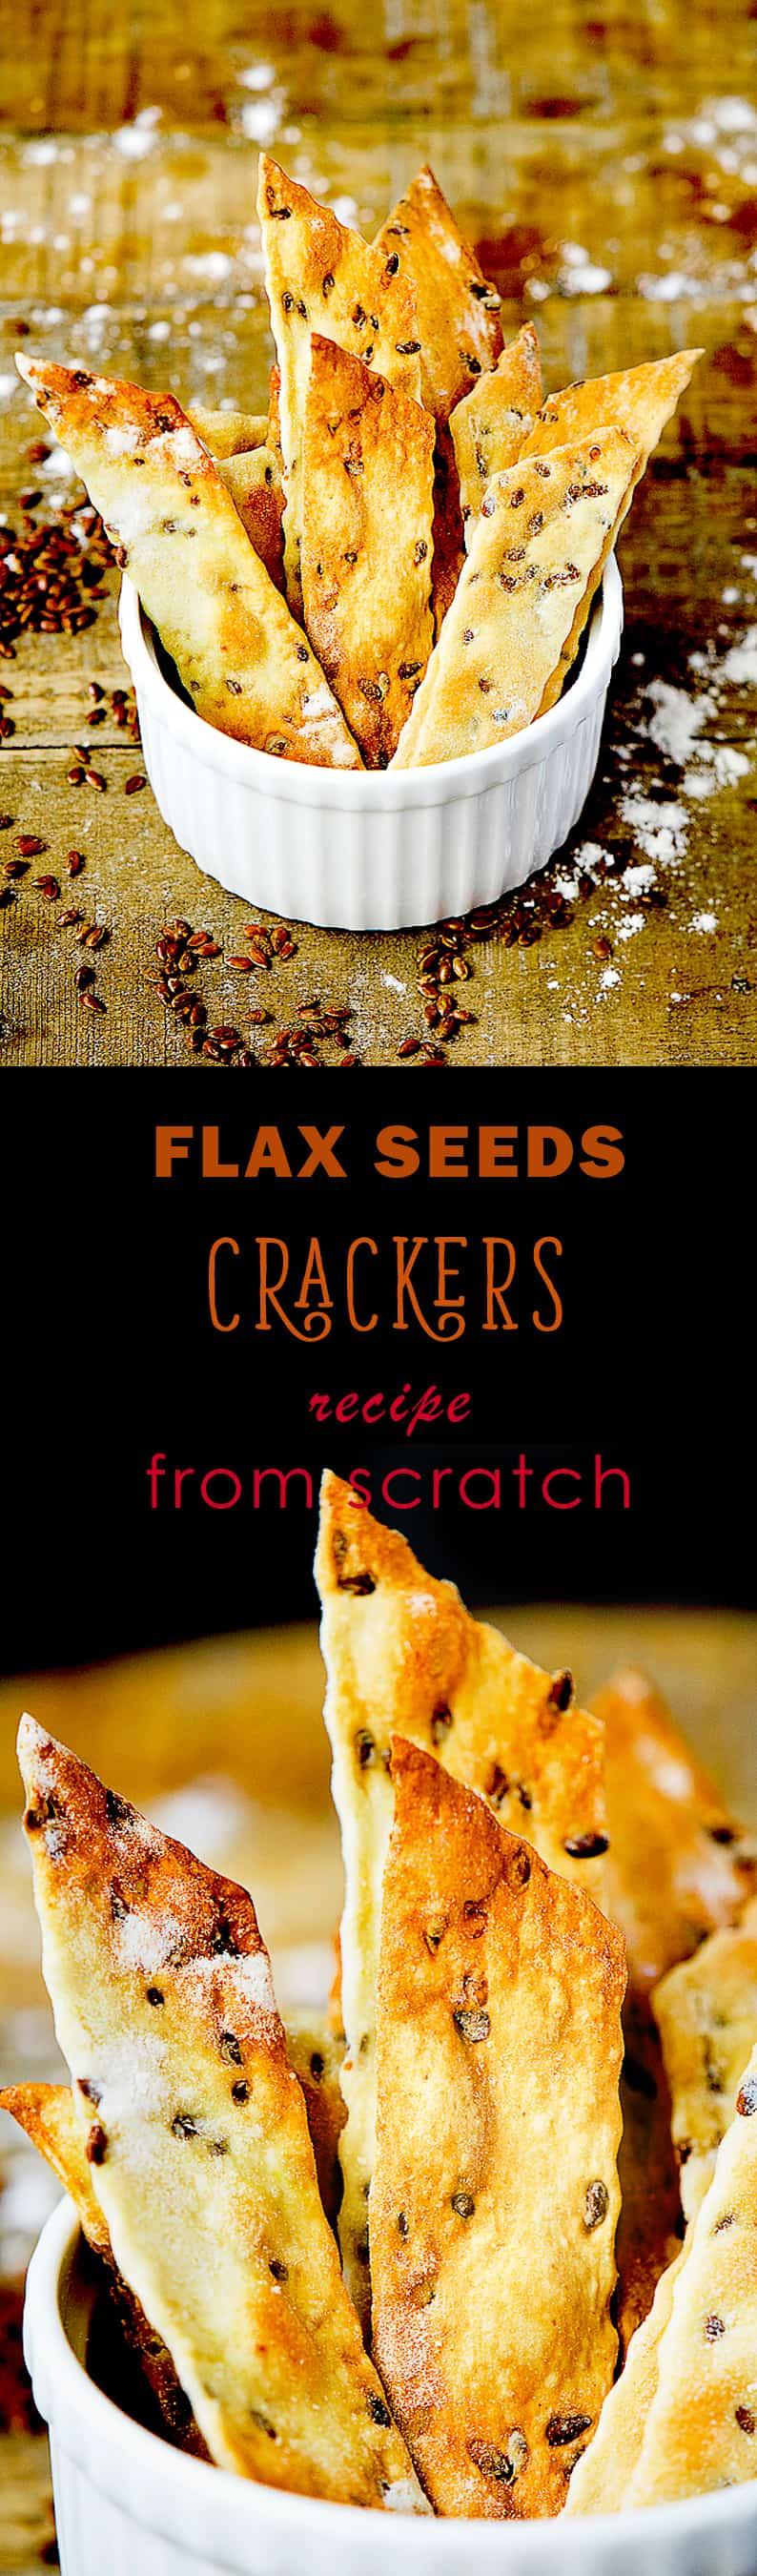 Cracker recipe